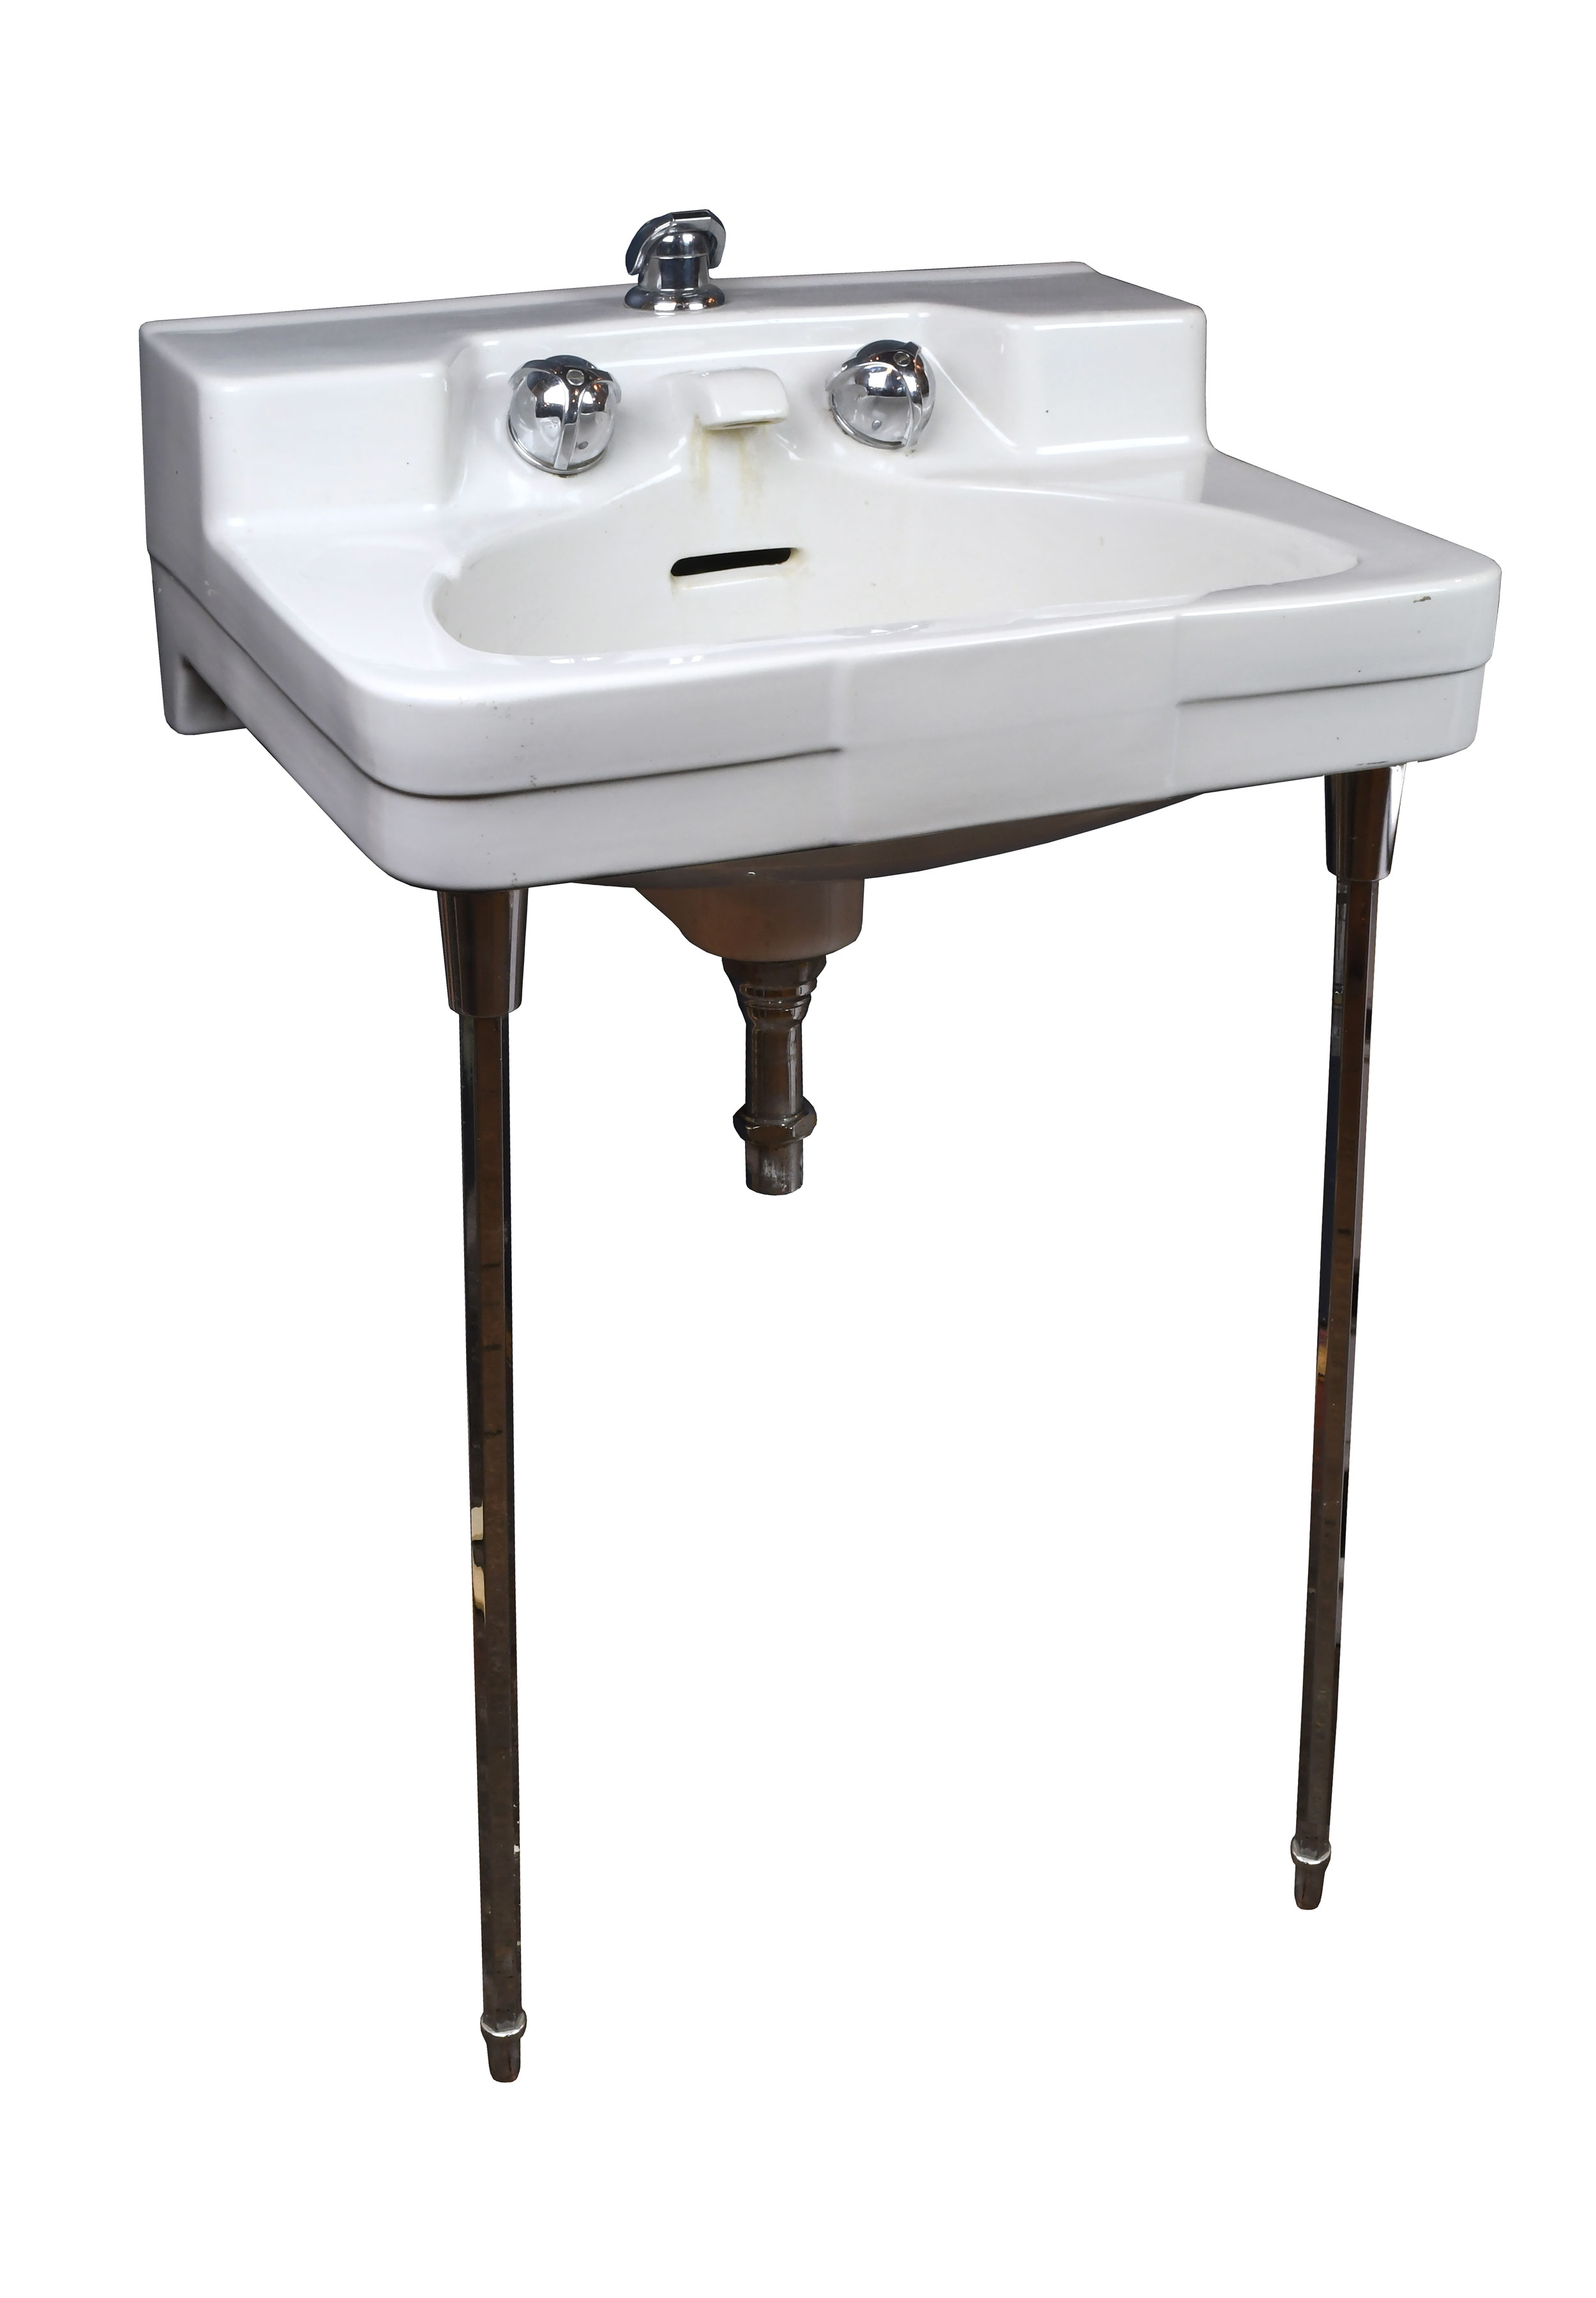 47249-1950s-wall-mount-sink-angle-view.jpg